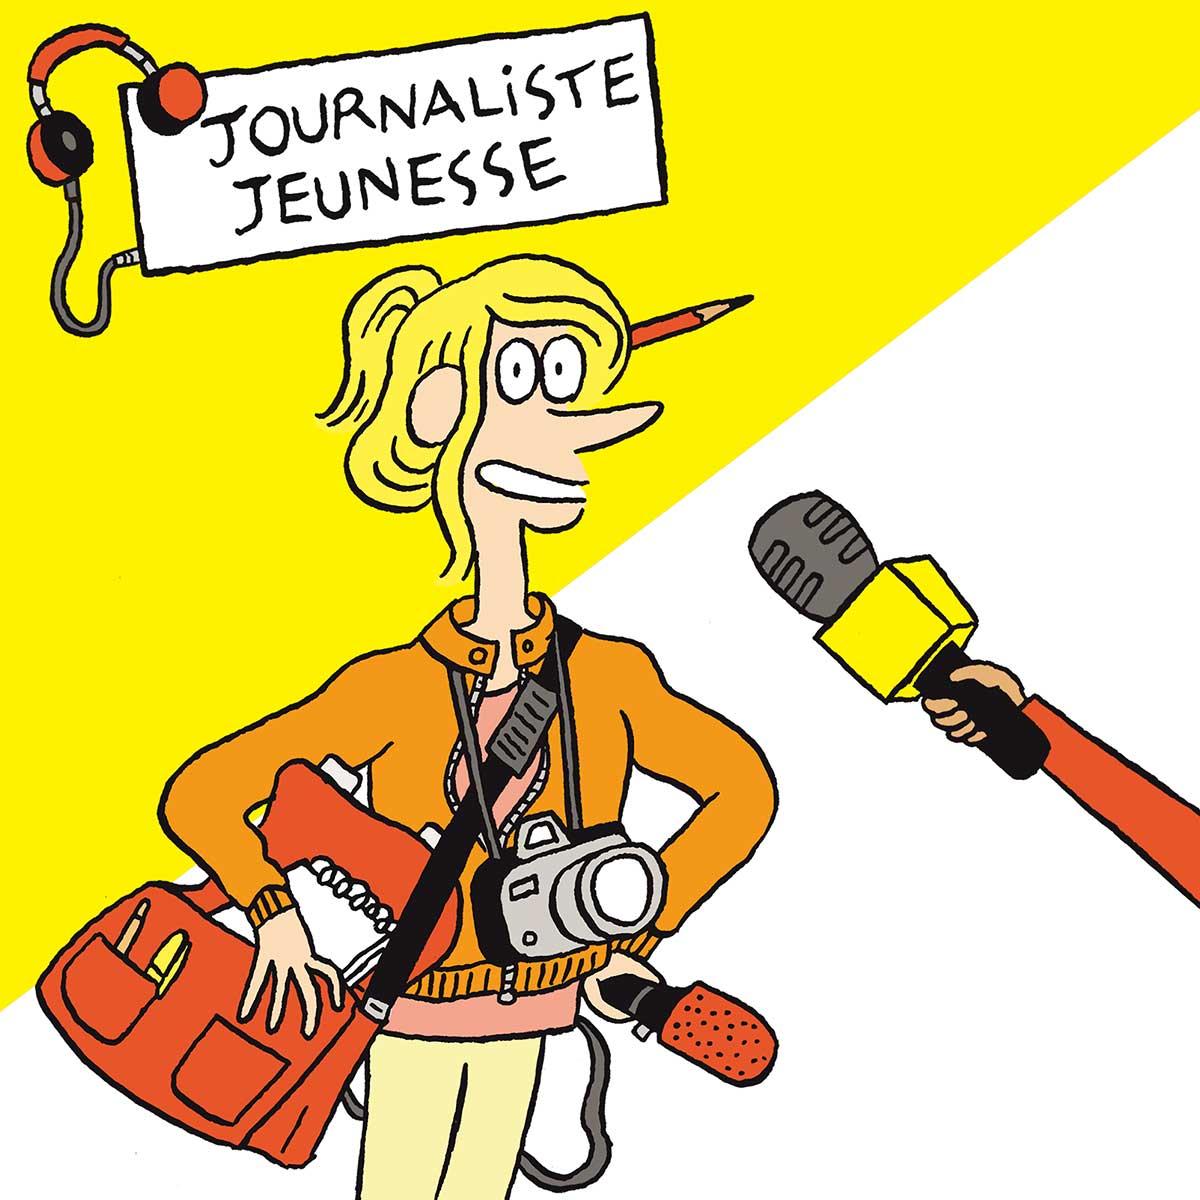 Journaliste Jeunesse